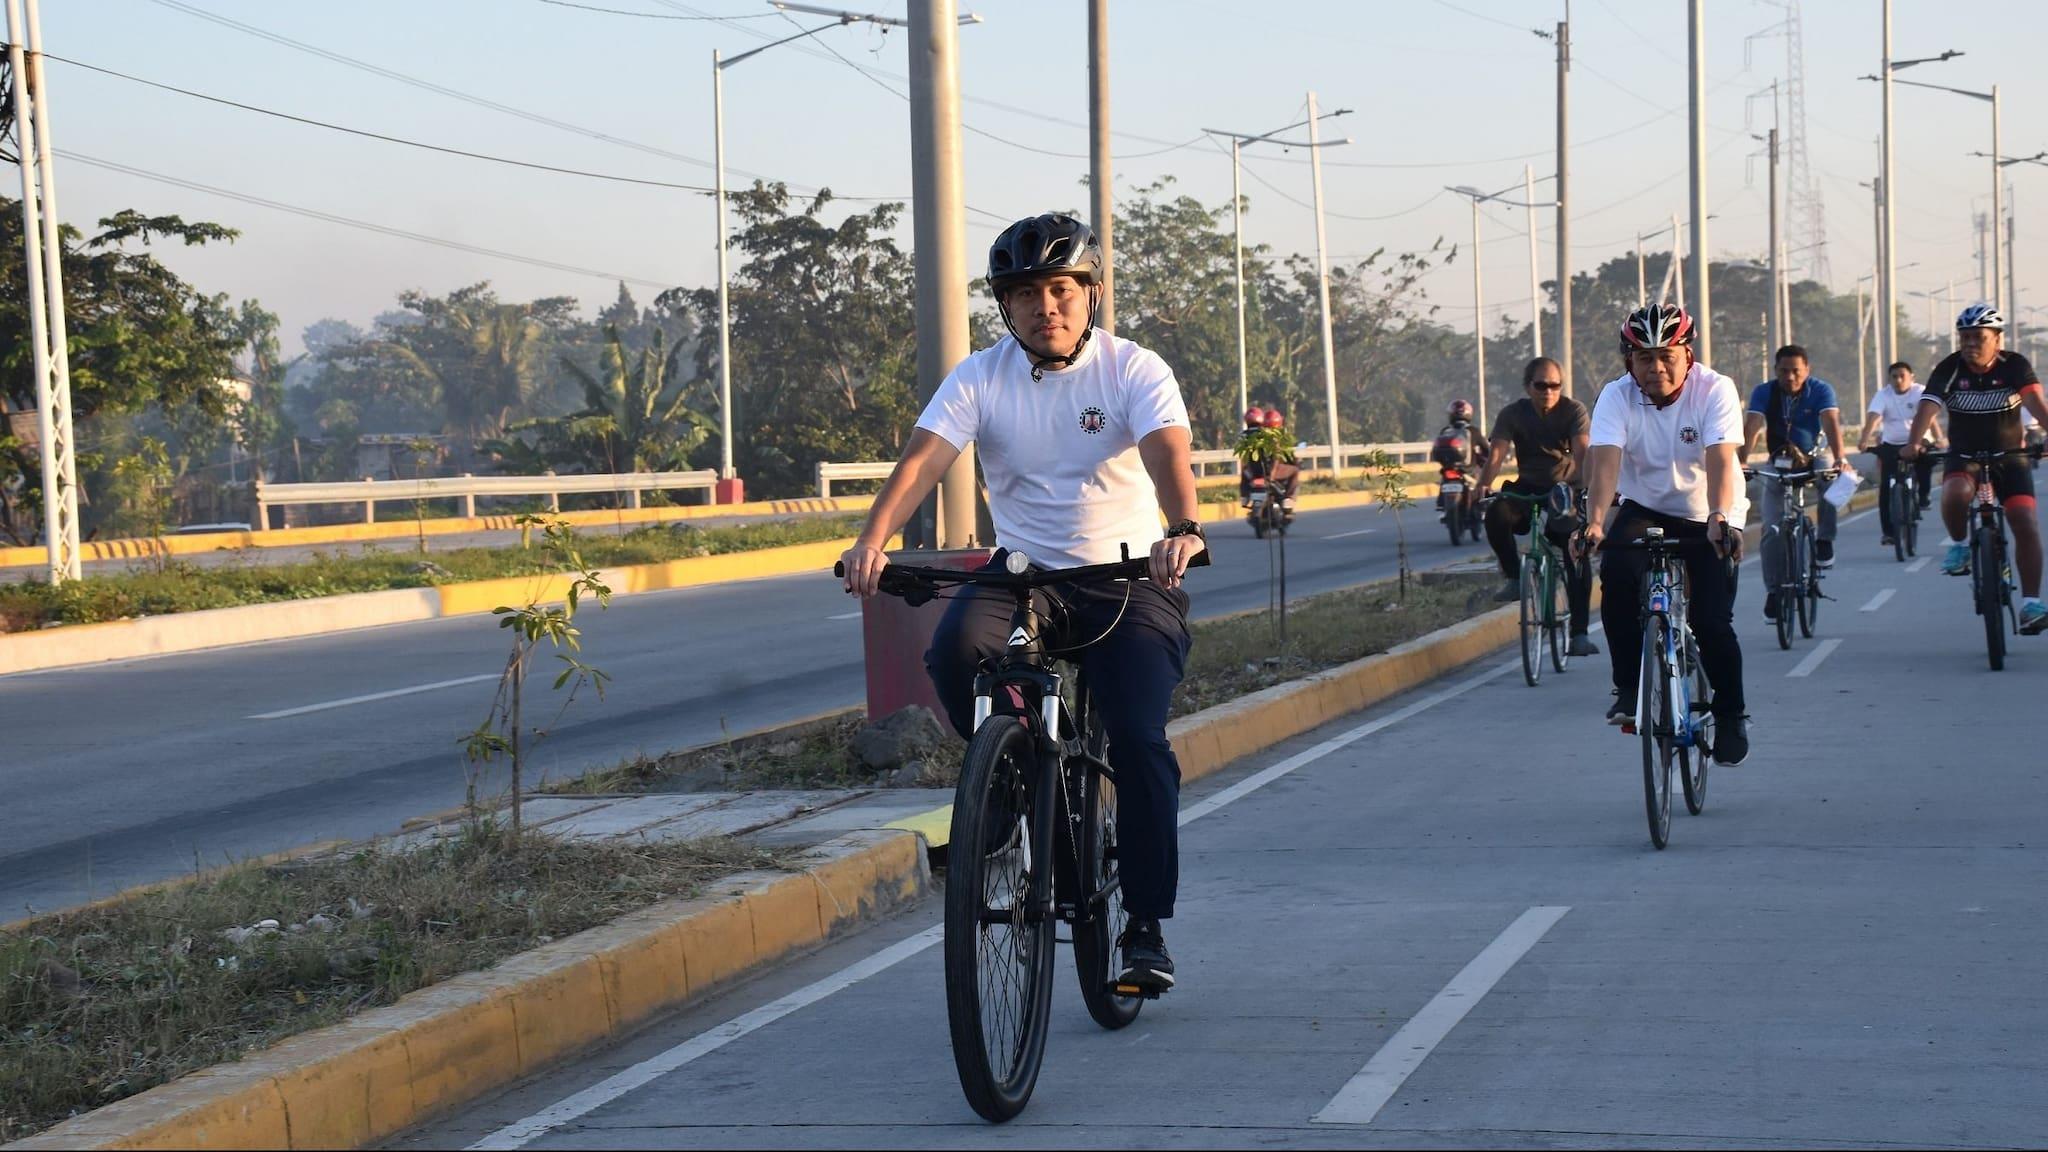 DPWH Opens 5.8-Km Protected Bike Lane along Laguna Lake Highway